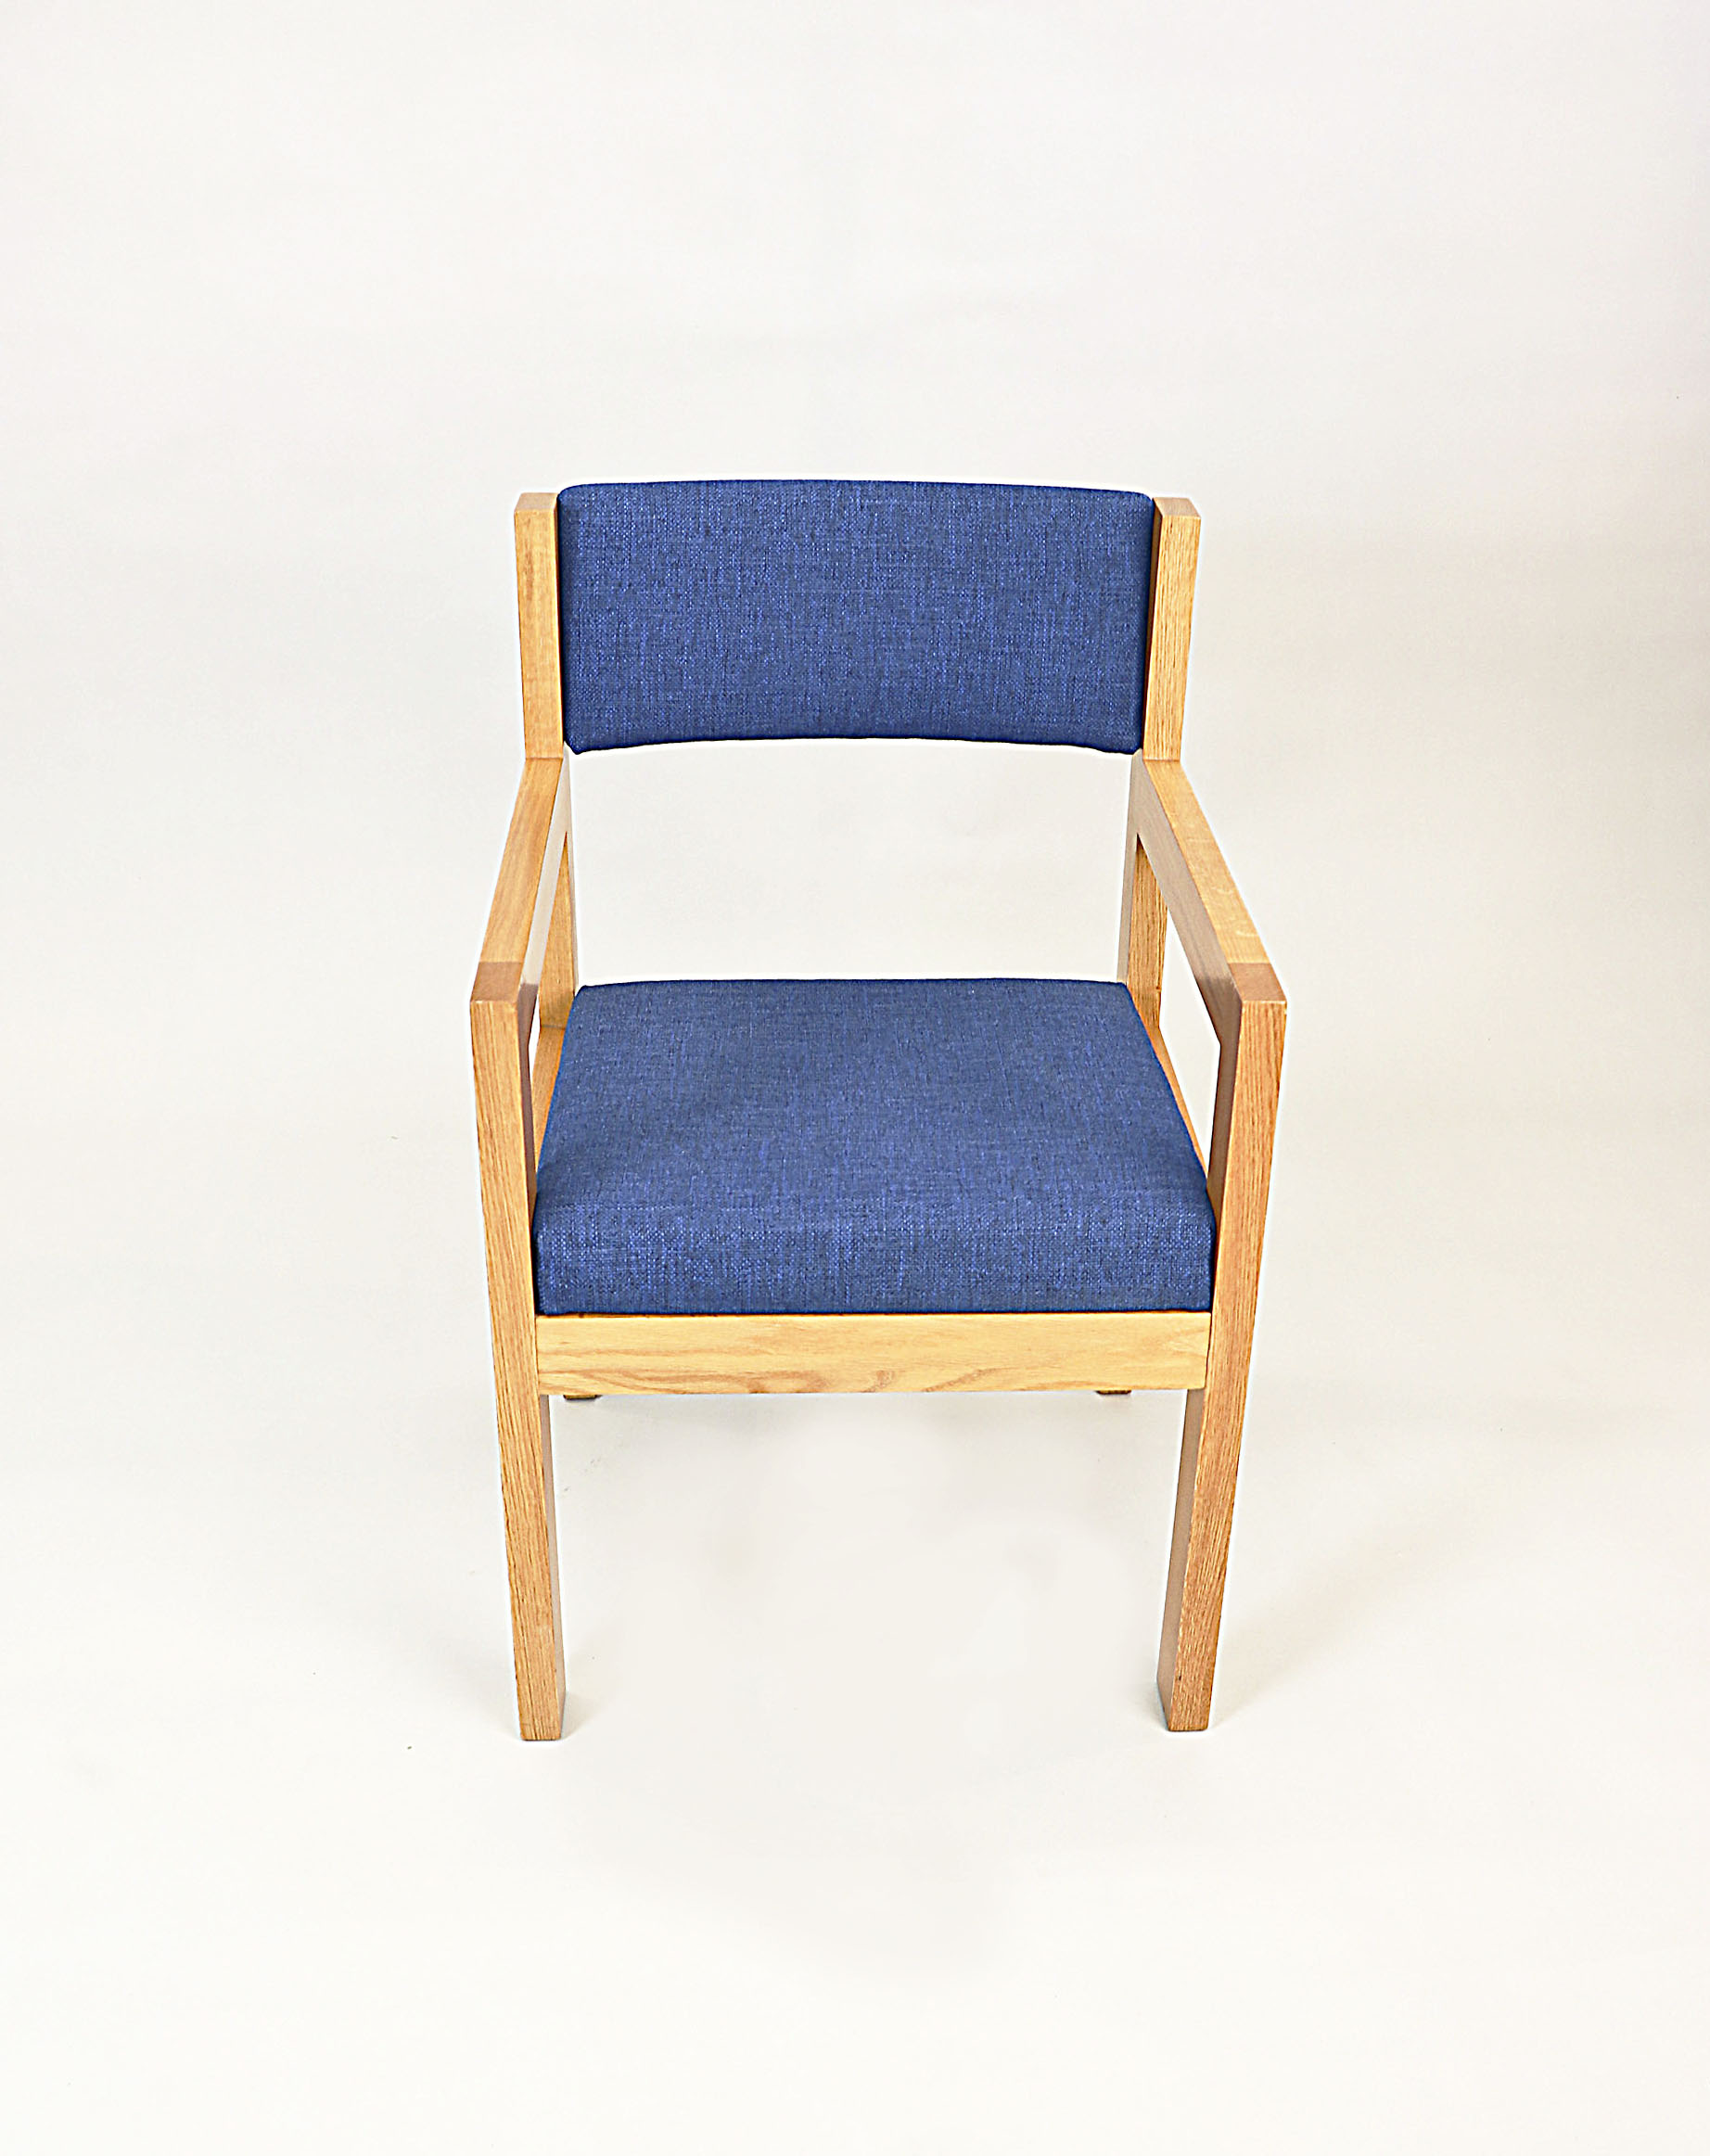 library chair3.jpg